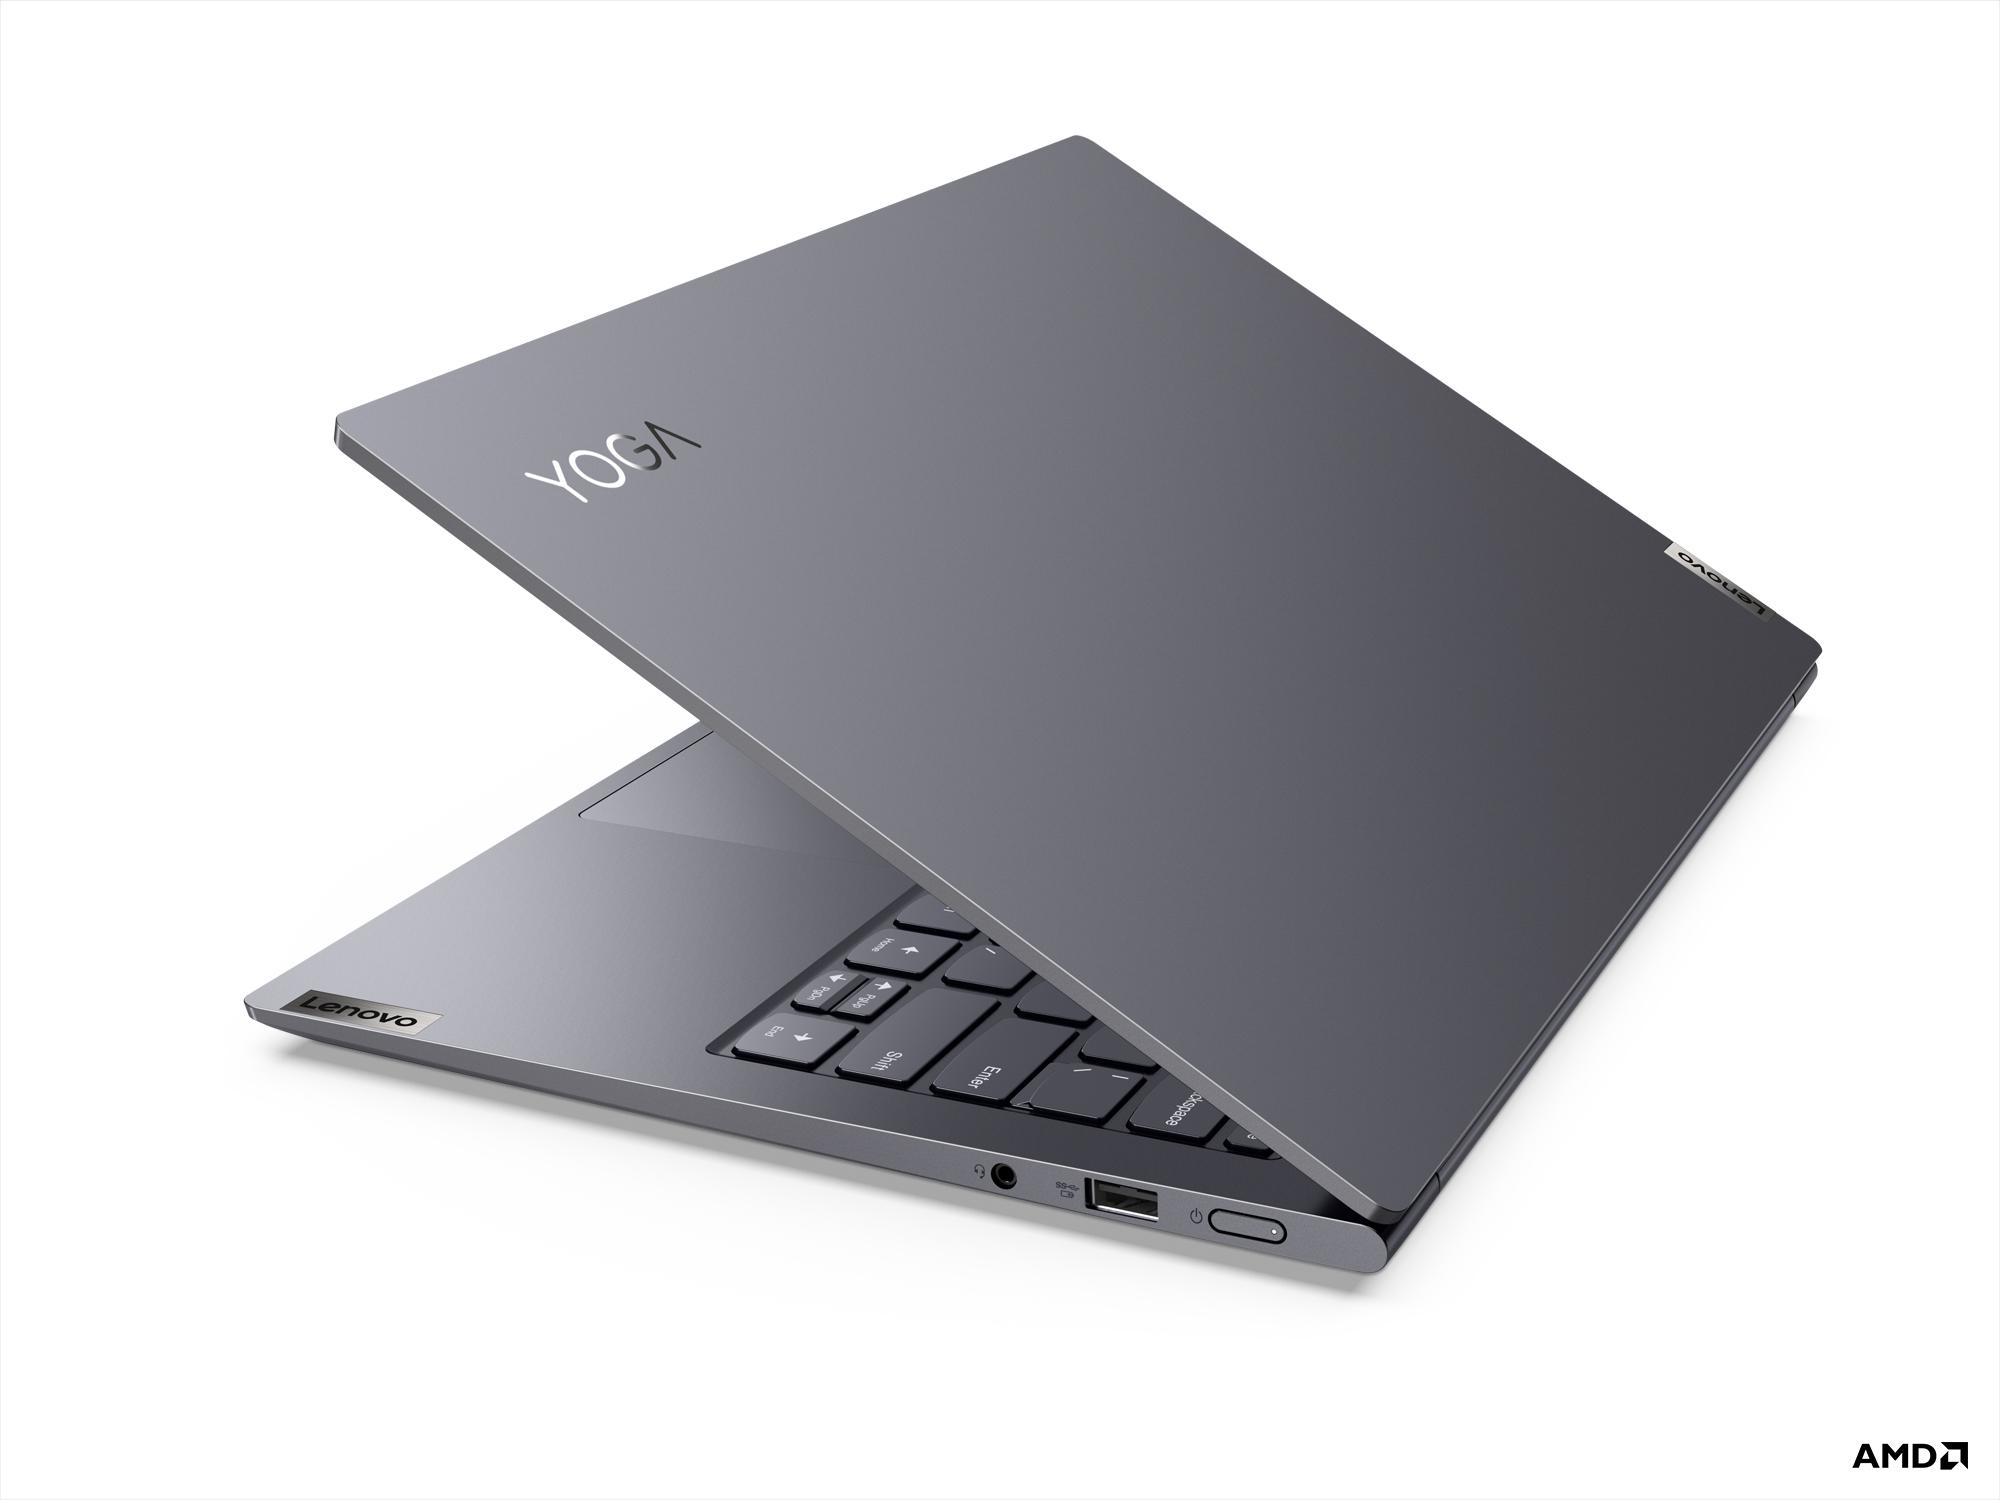 Yoga PC image